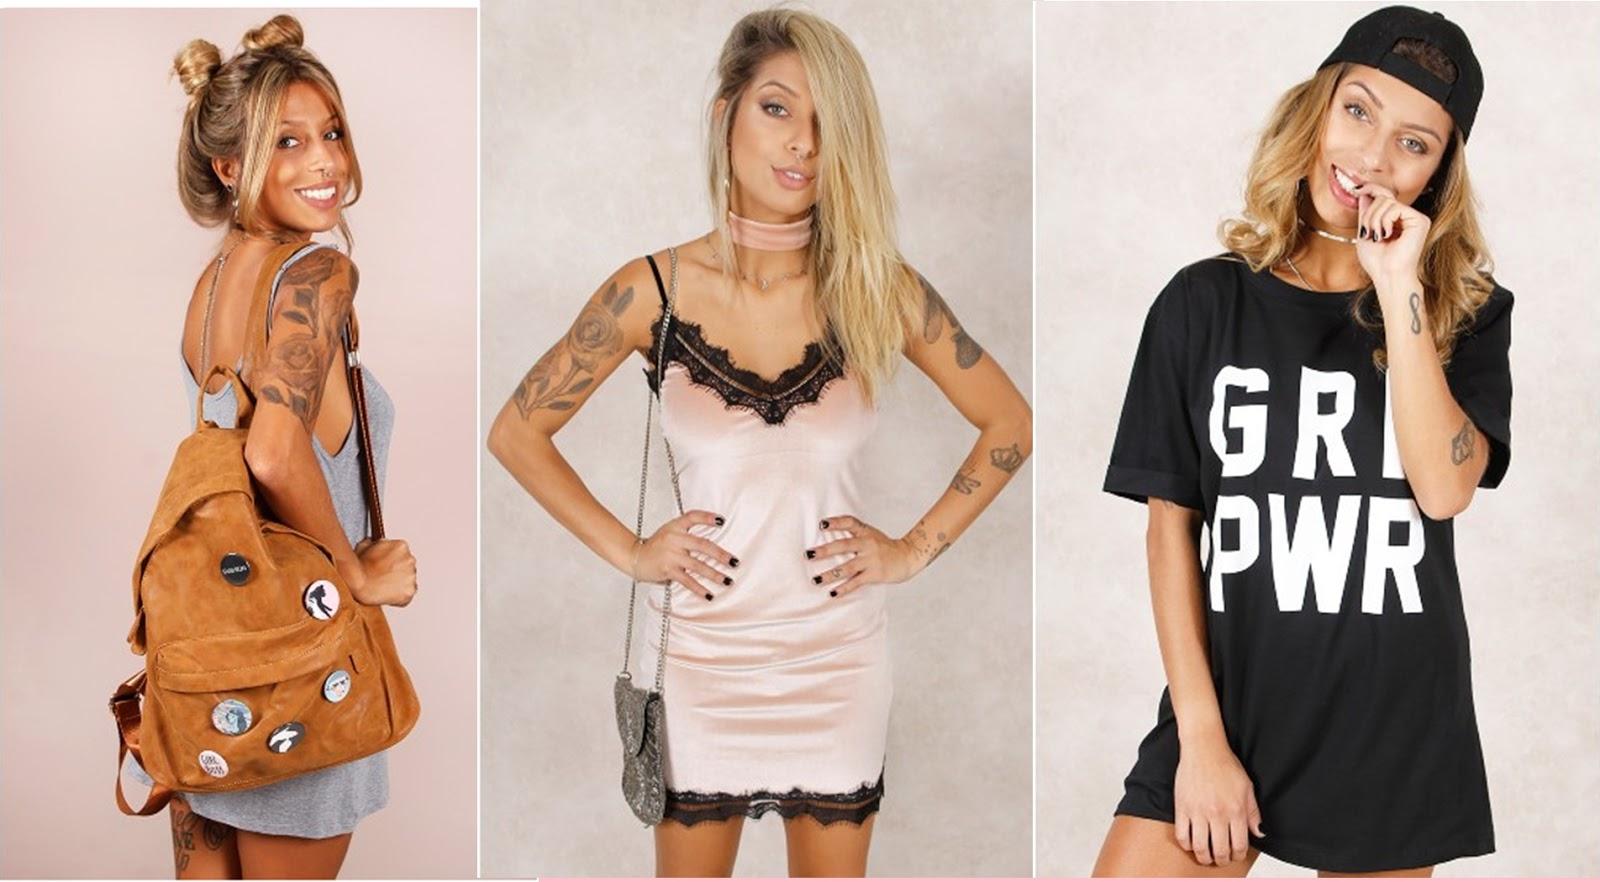 84dc35329 As Vantagens de ser Garota.  10 lojas para comprar roupas estilo tumblr